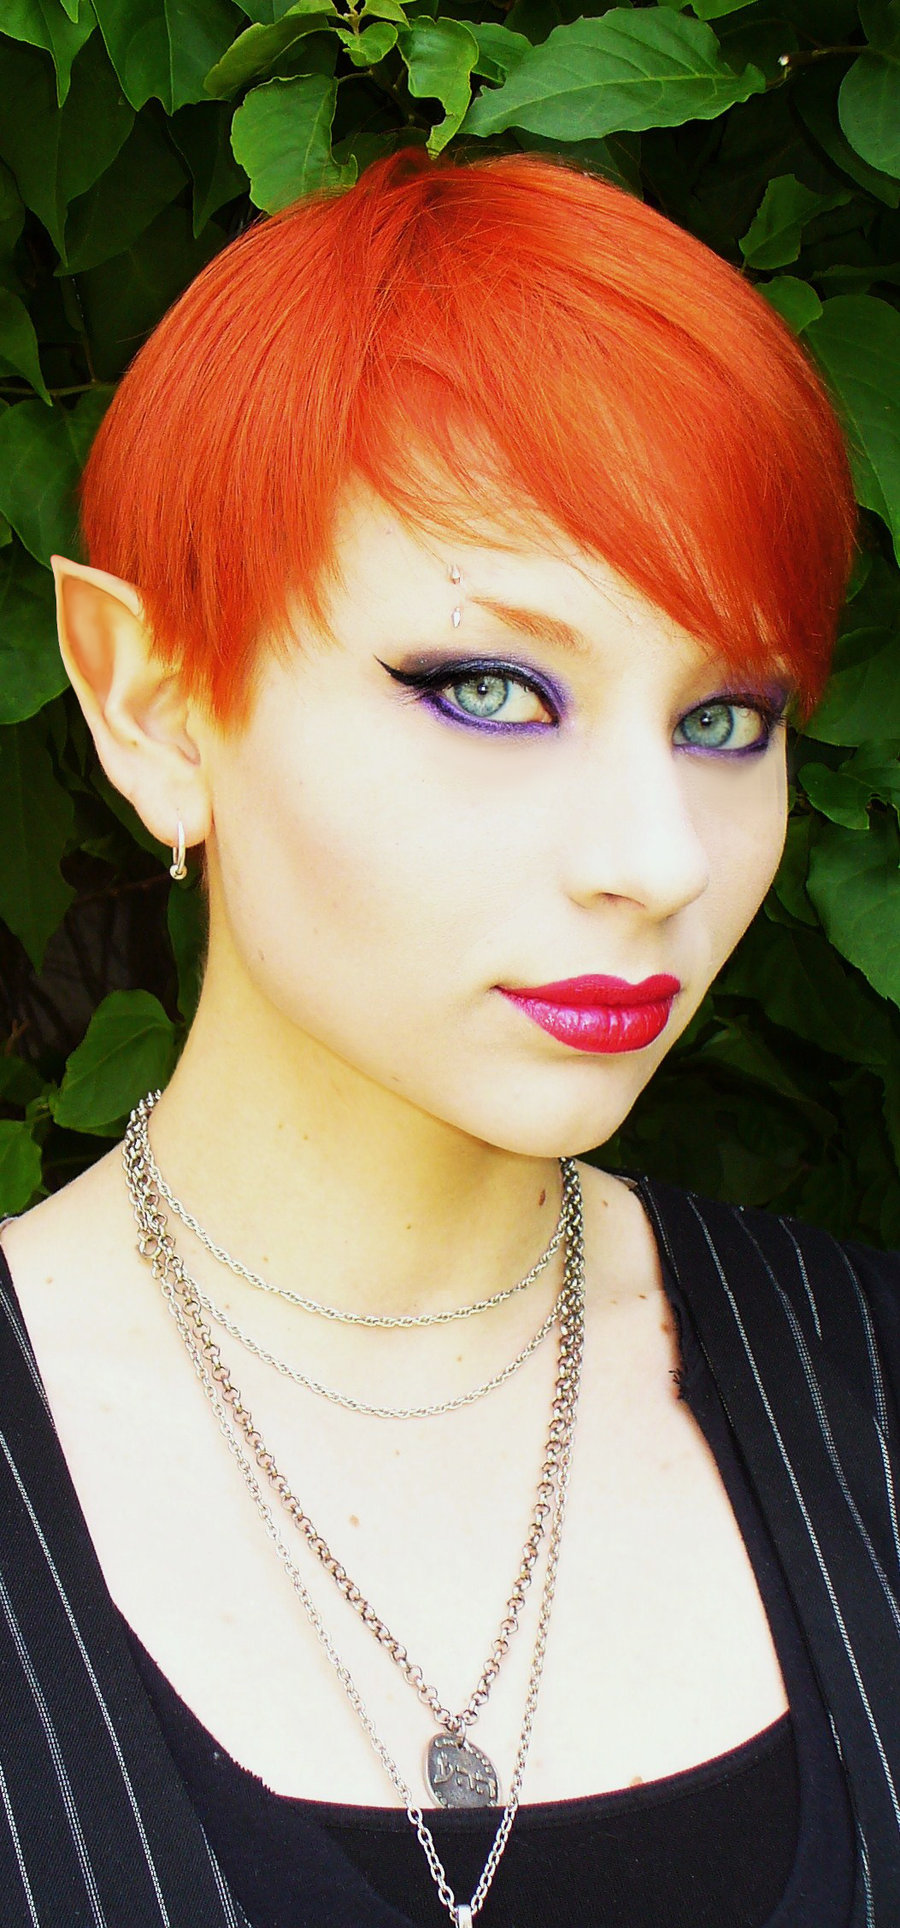 Download Wallpaper Beautiful Girl Elf Woman Photo